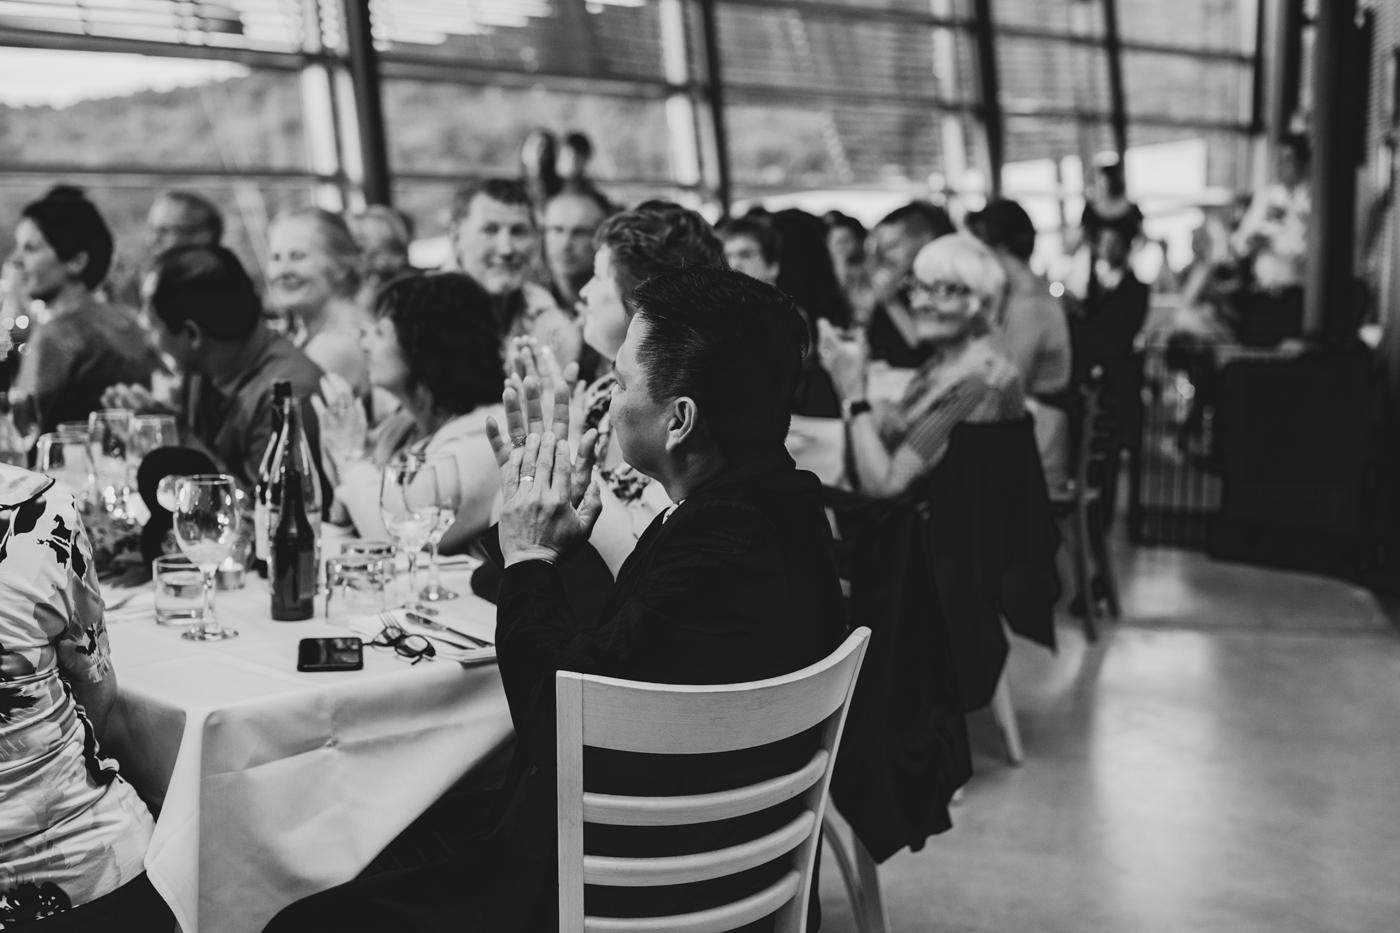 Ariana & Tim - Dunedin, New Zealand Wedding - Destination Wedding - Samantha Heather Photography-242.jpg